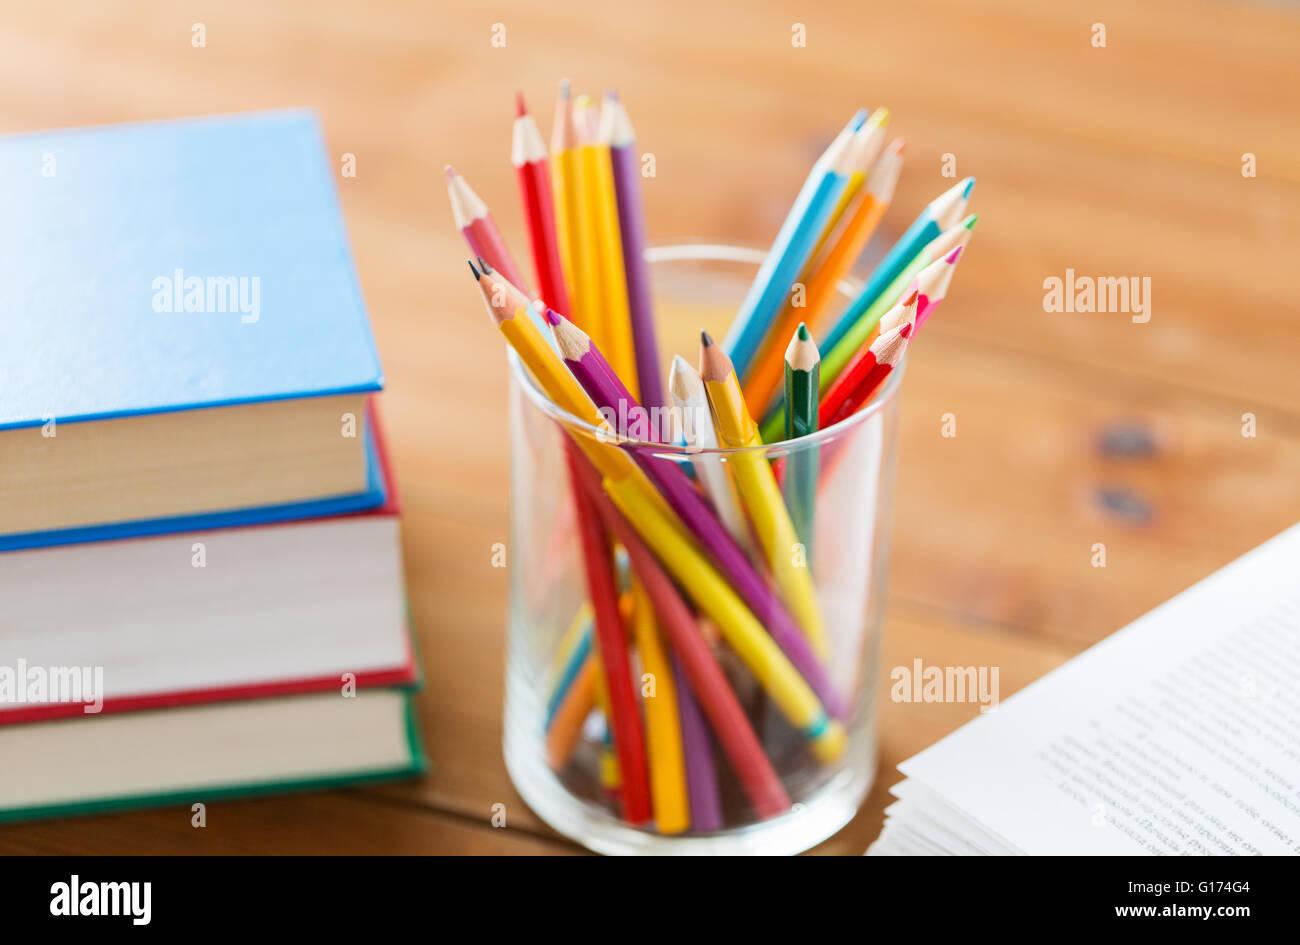 Coloring Book Crayons Nobody Stock Photos & Coloring Book Crayons ...